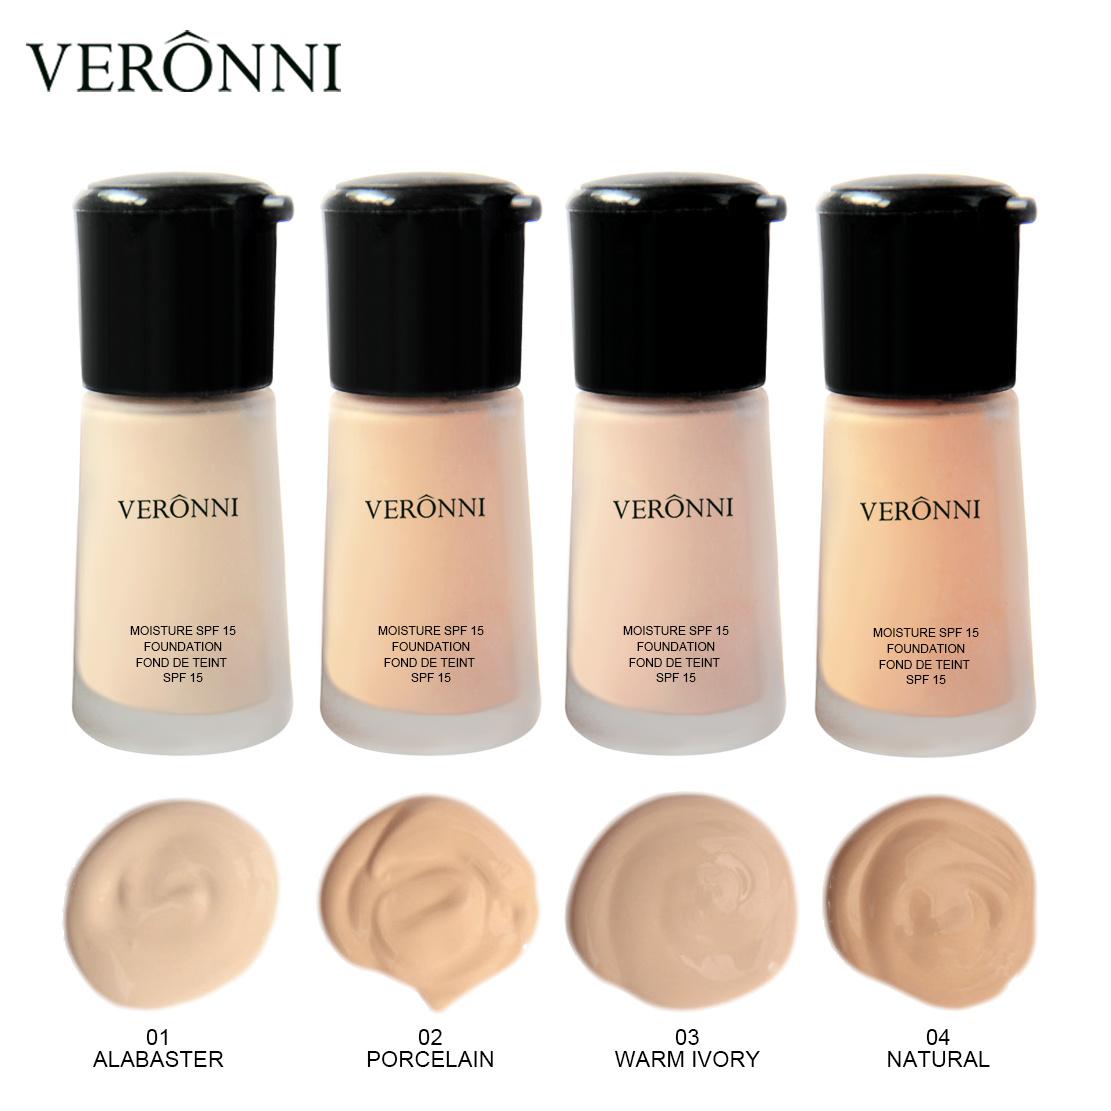 China Veronni 4 Colors Foundation Waterproof Base Makeup China Foundation Makeup Liquid And Makeup Foundation Price